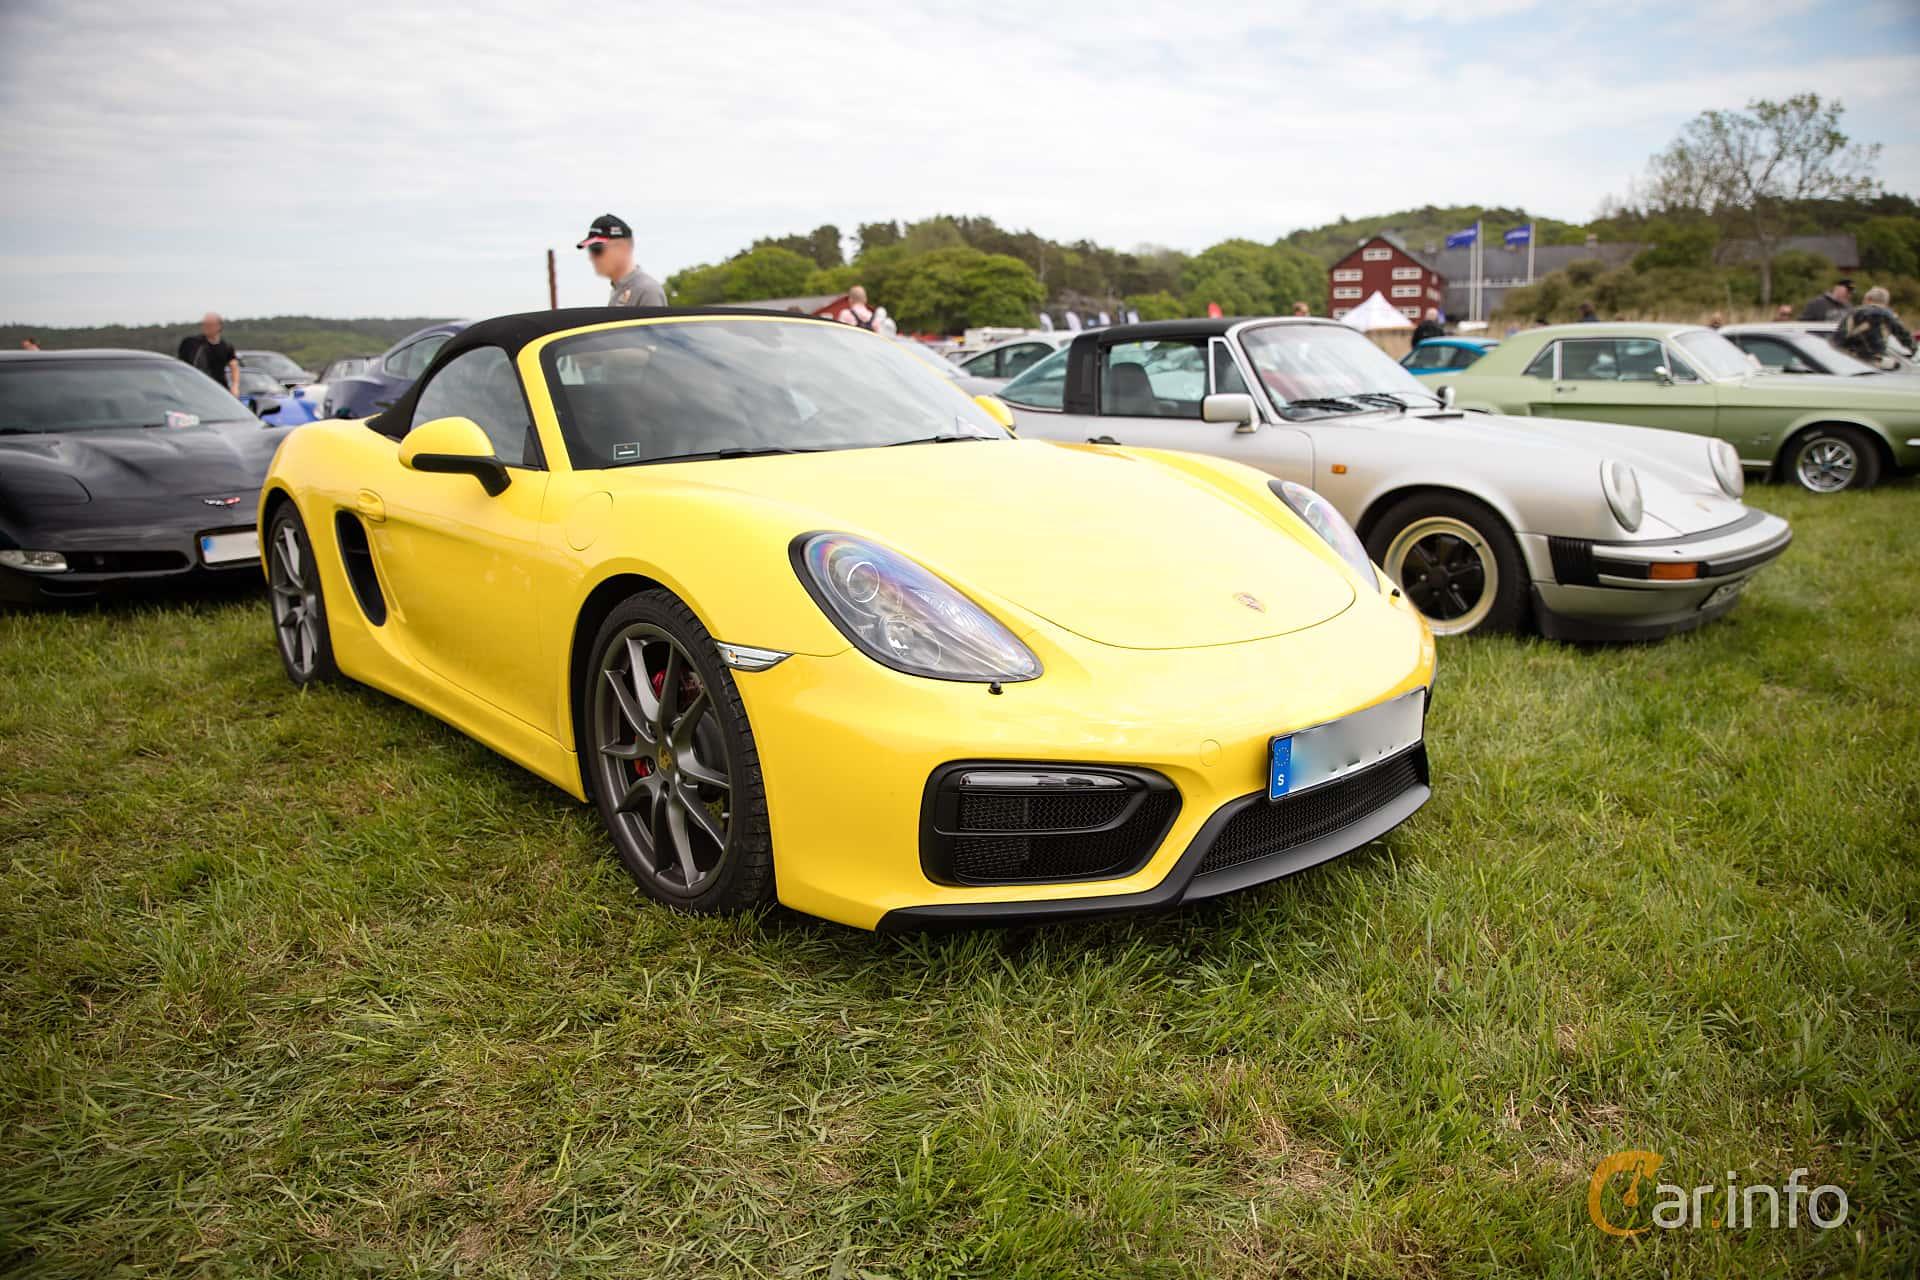 Porsche Boxster GTS 3.4 H6 PDK, 330hp, 2016 at Tjolöholm Classic Motor 2016